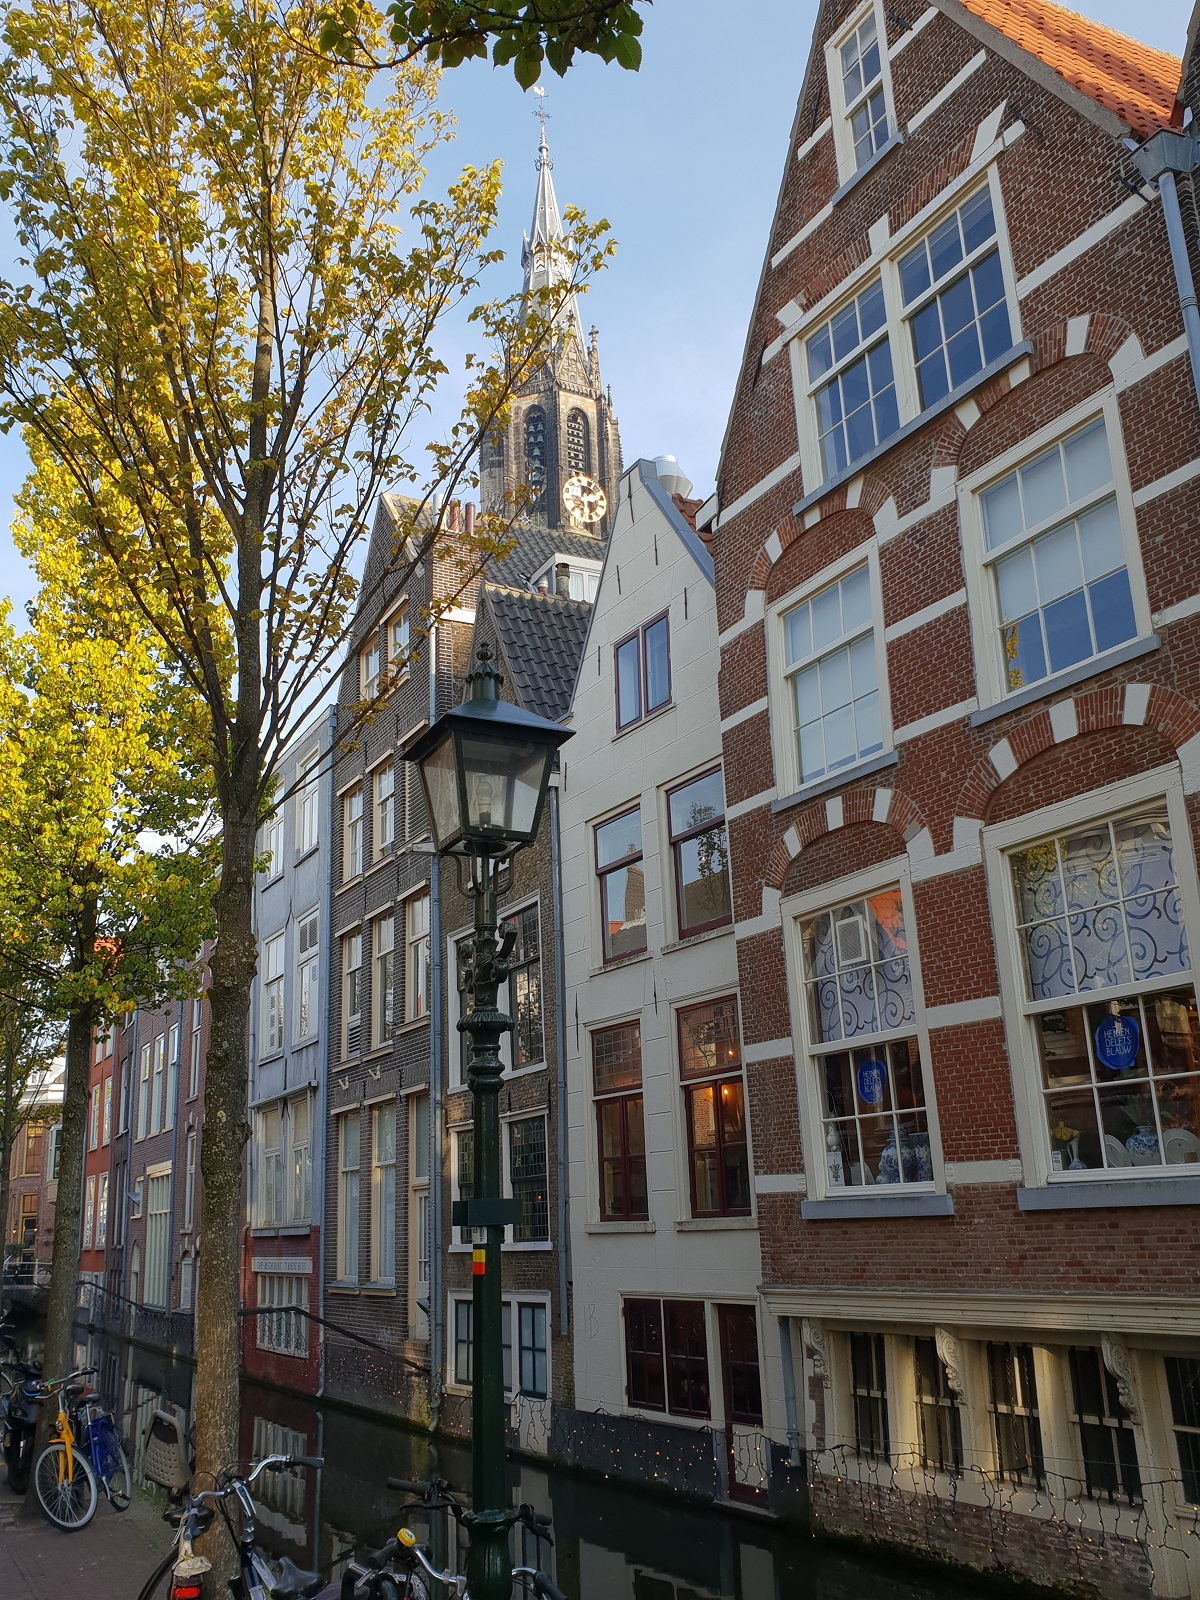 Grachtenpand_Delft_uitjes_Zuid_Holland